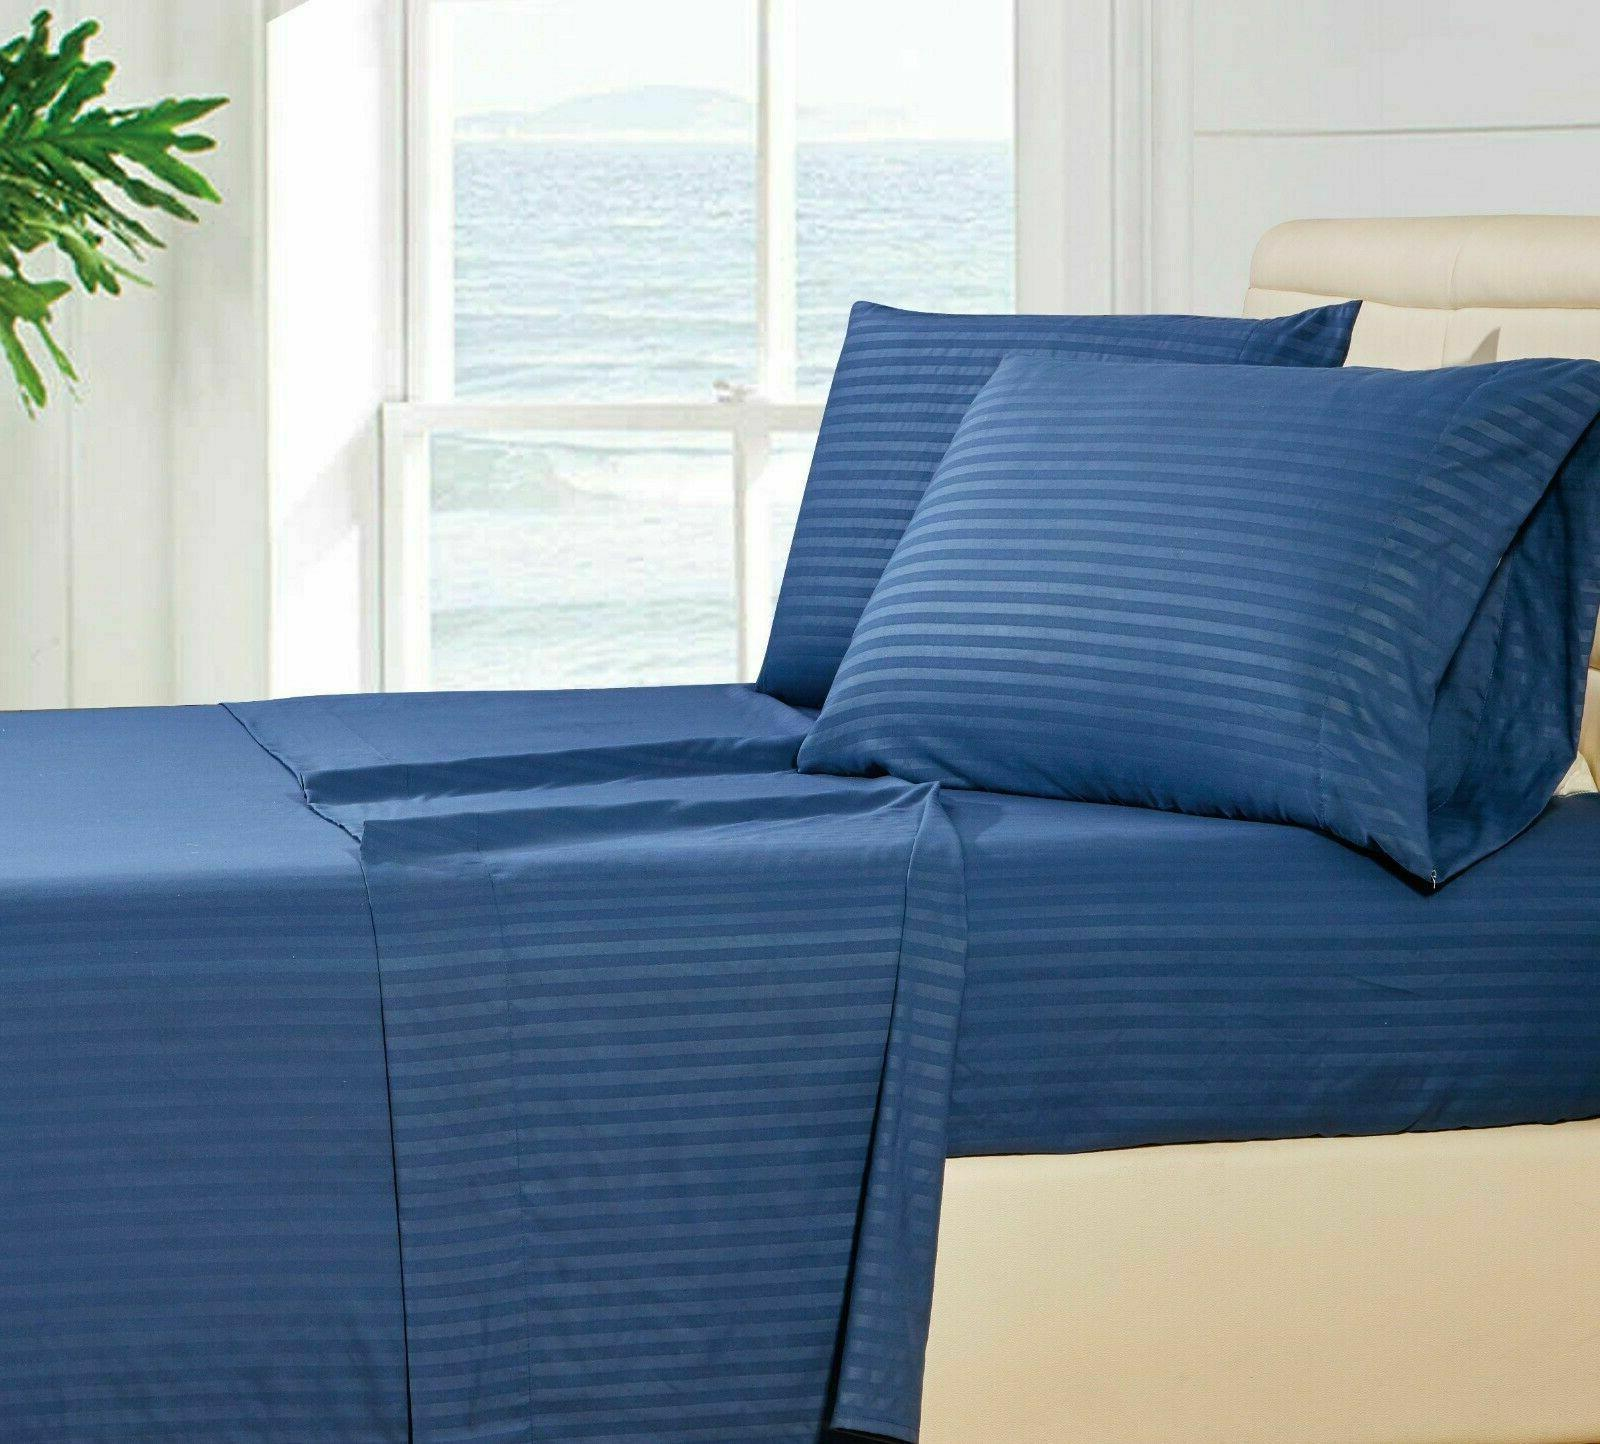 1800 Count Deep Pocket 4 Piece Stripe Bed Sheet Egyptian Com